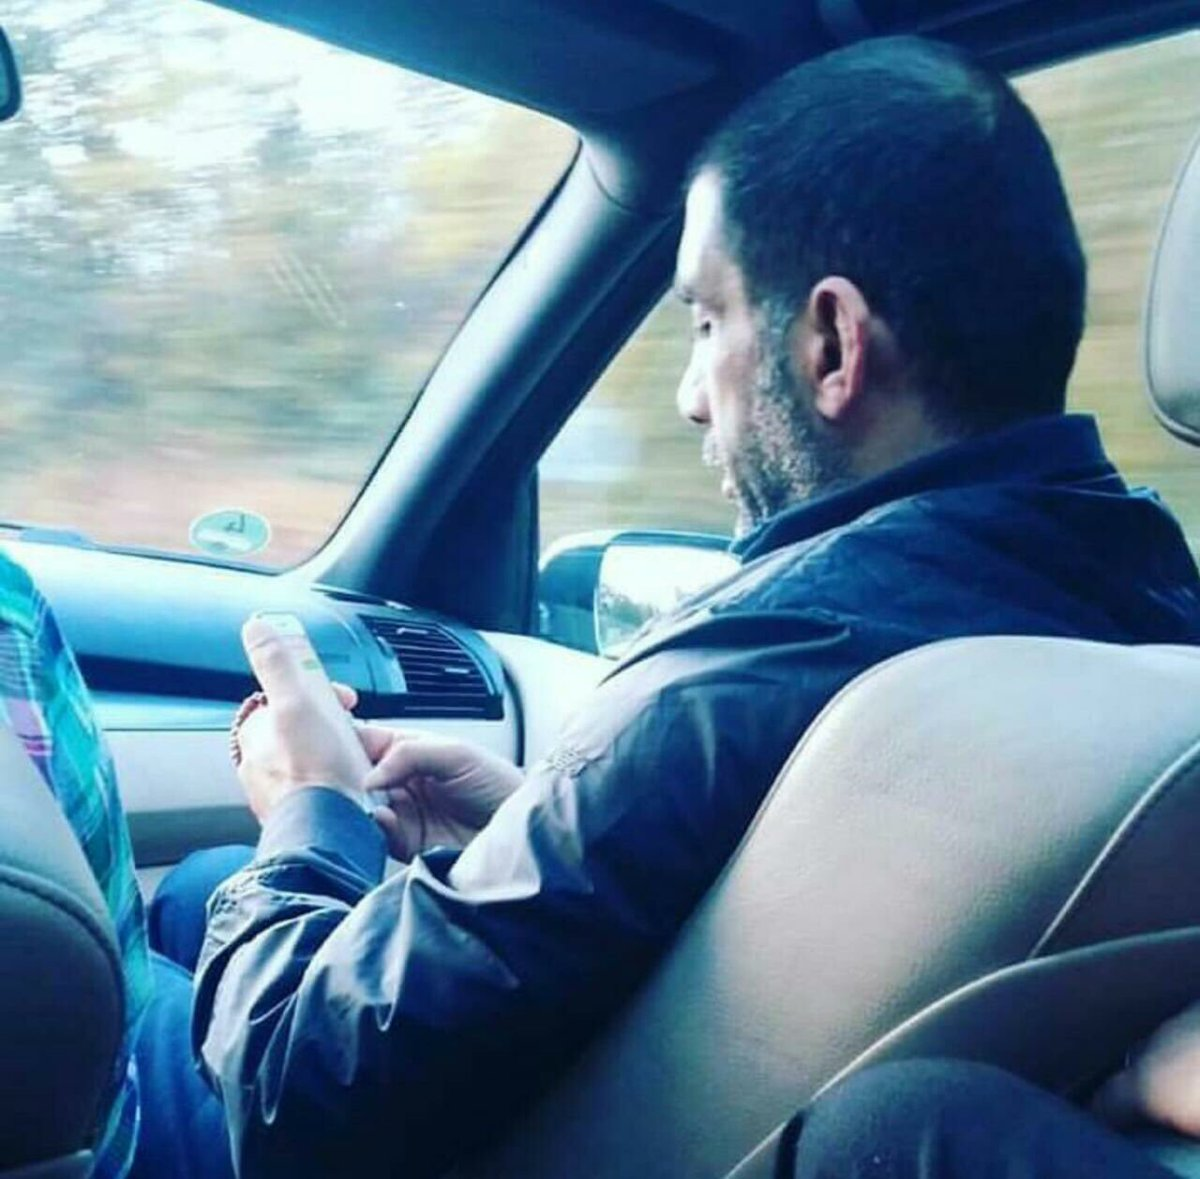 RT @mustafauk13: Allah Sana Rahmet Etsin...#Abim #SefaKalya https://t.co/jcBI036BMC